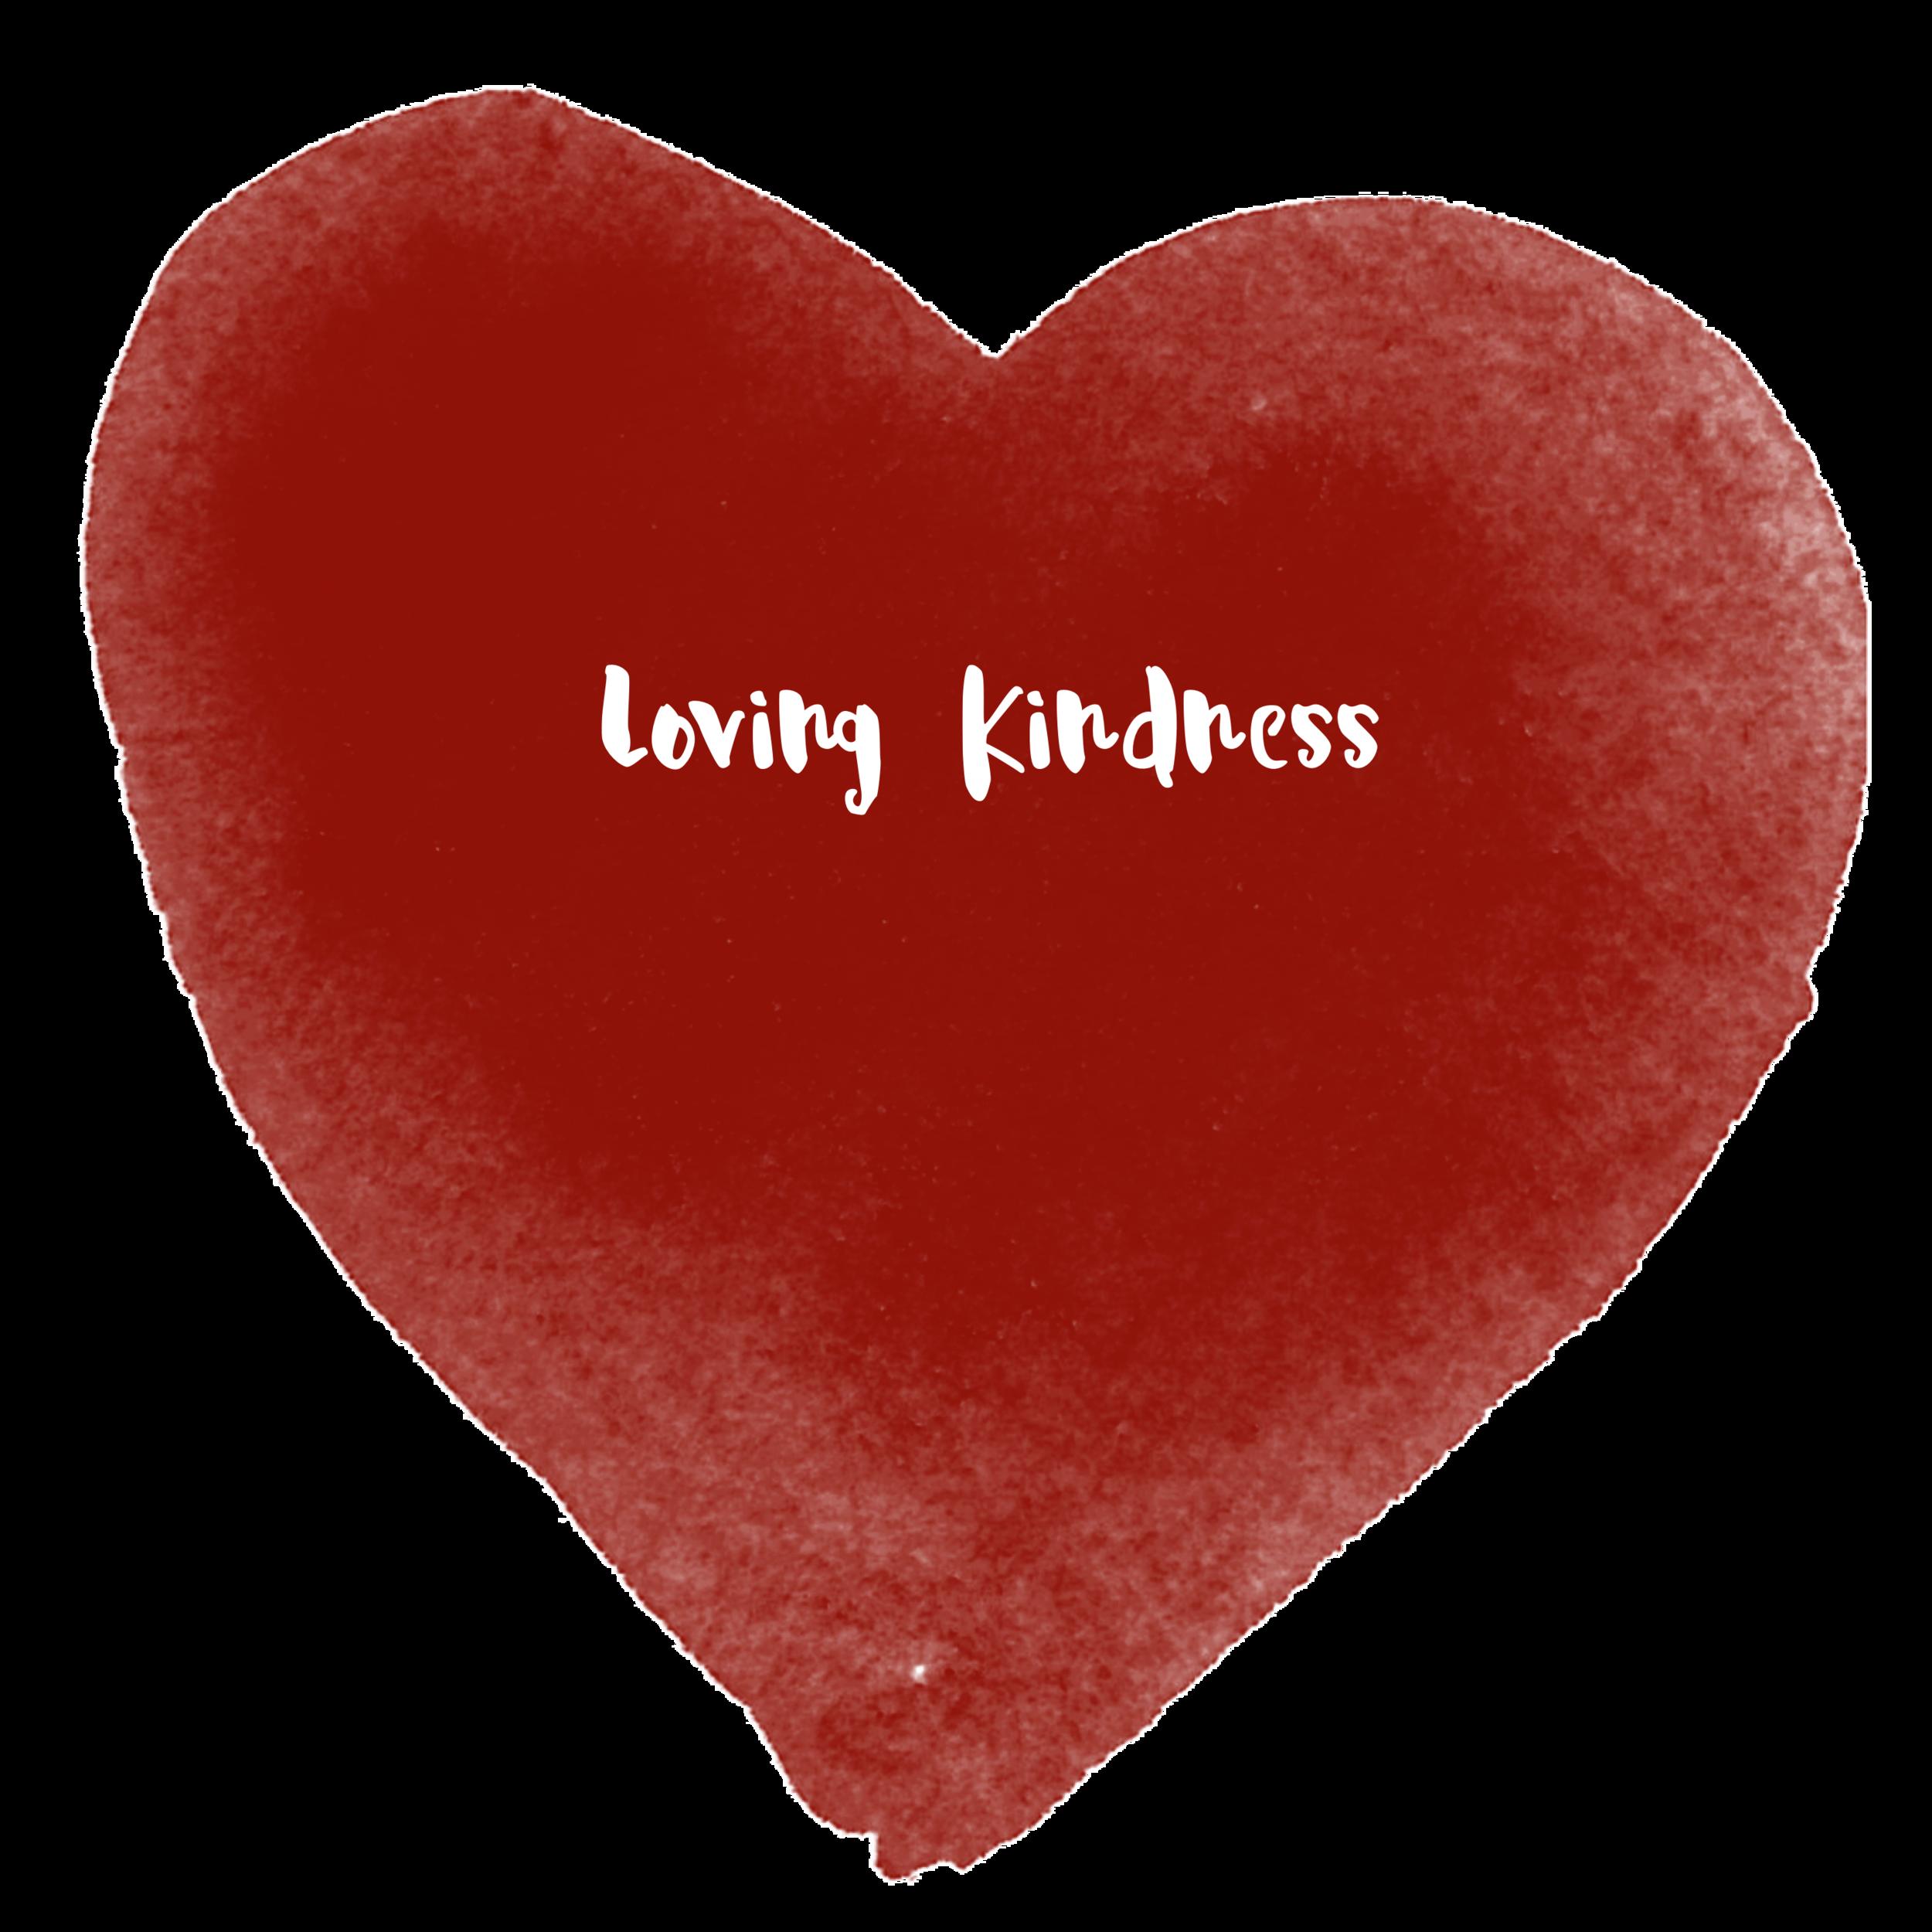 LovingKindess.png